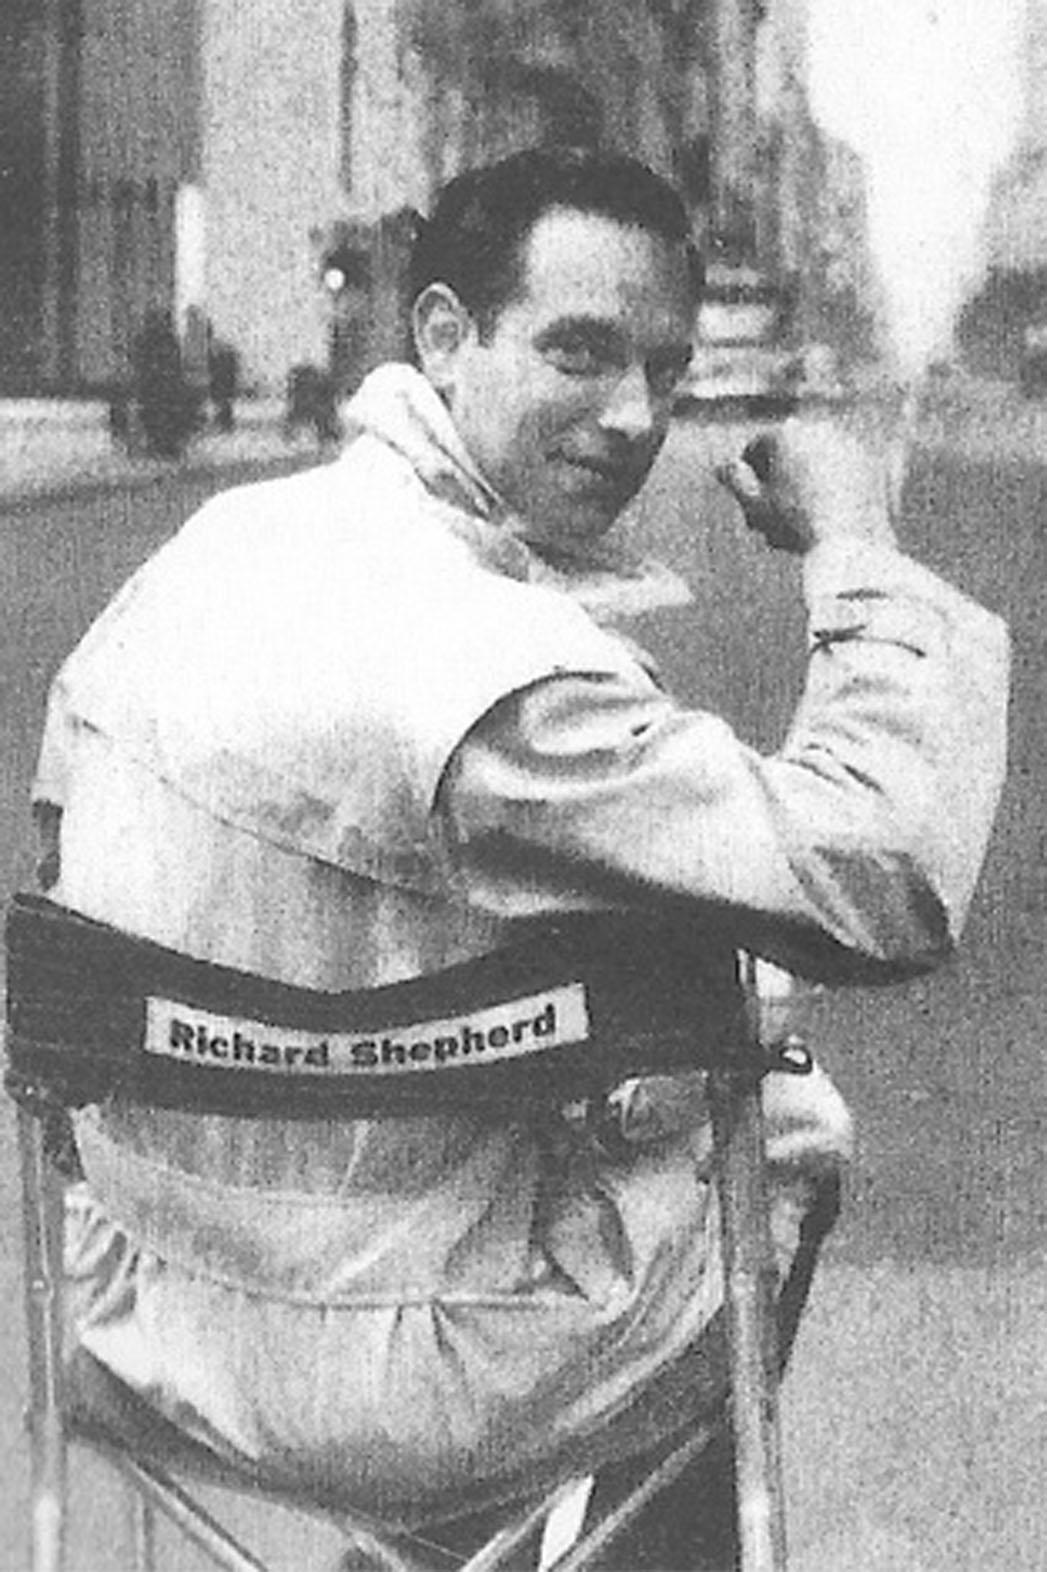 richard_shepherd_a_p_0